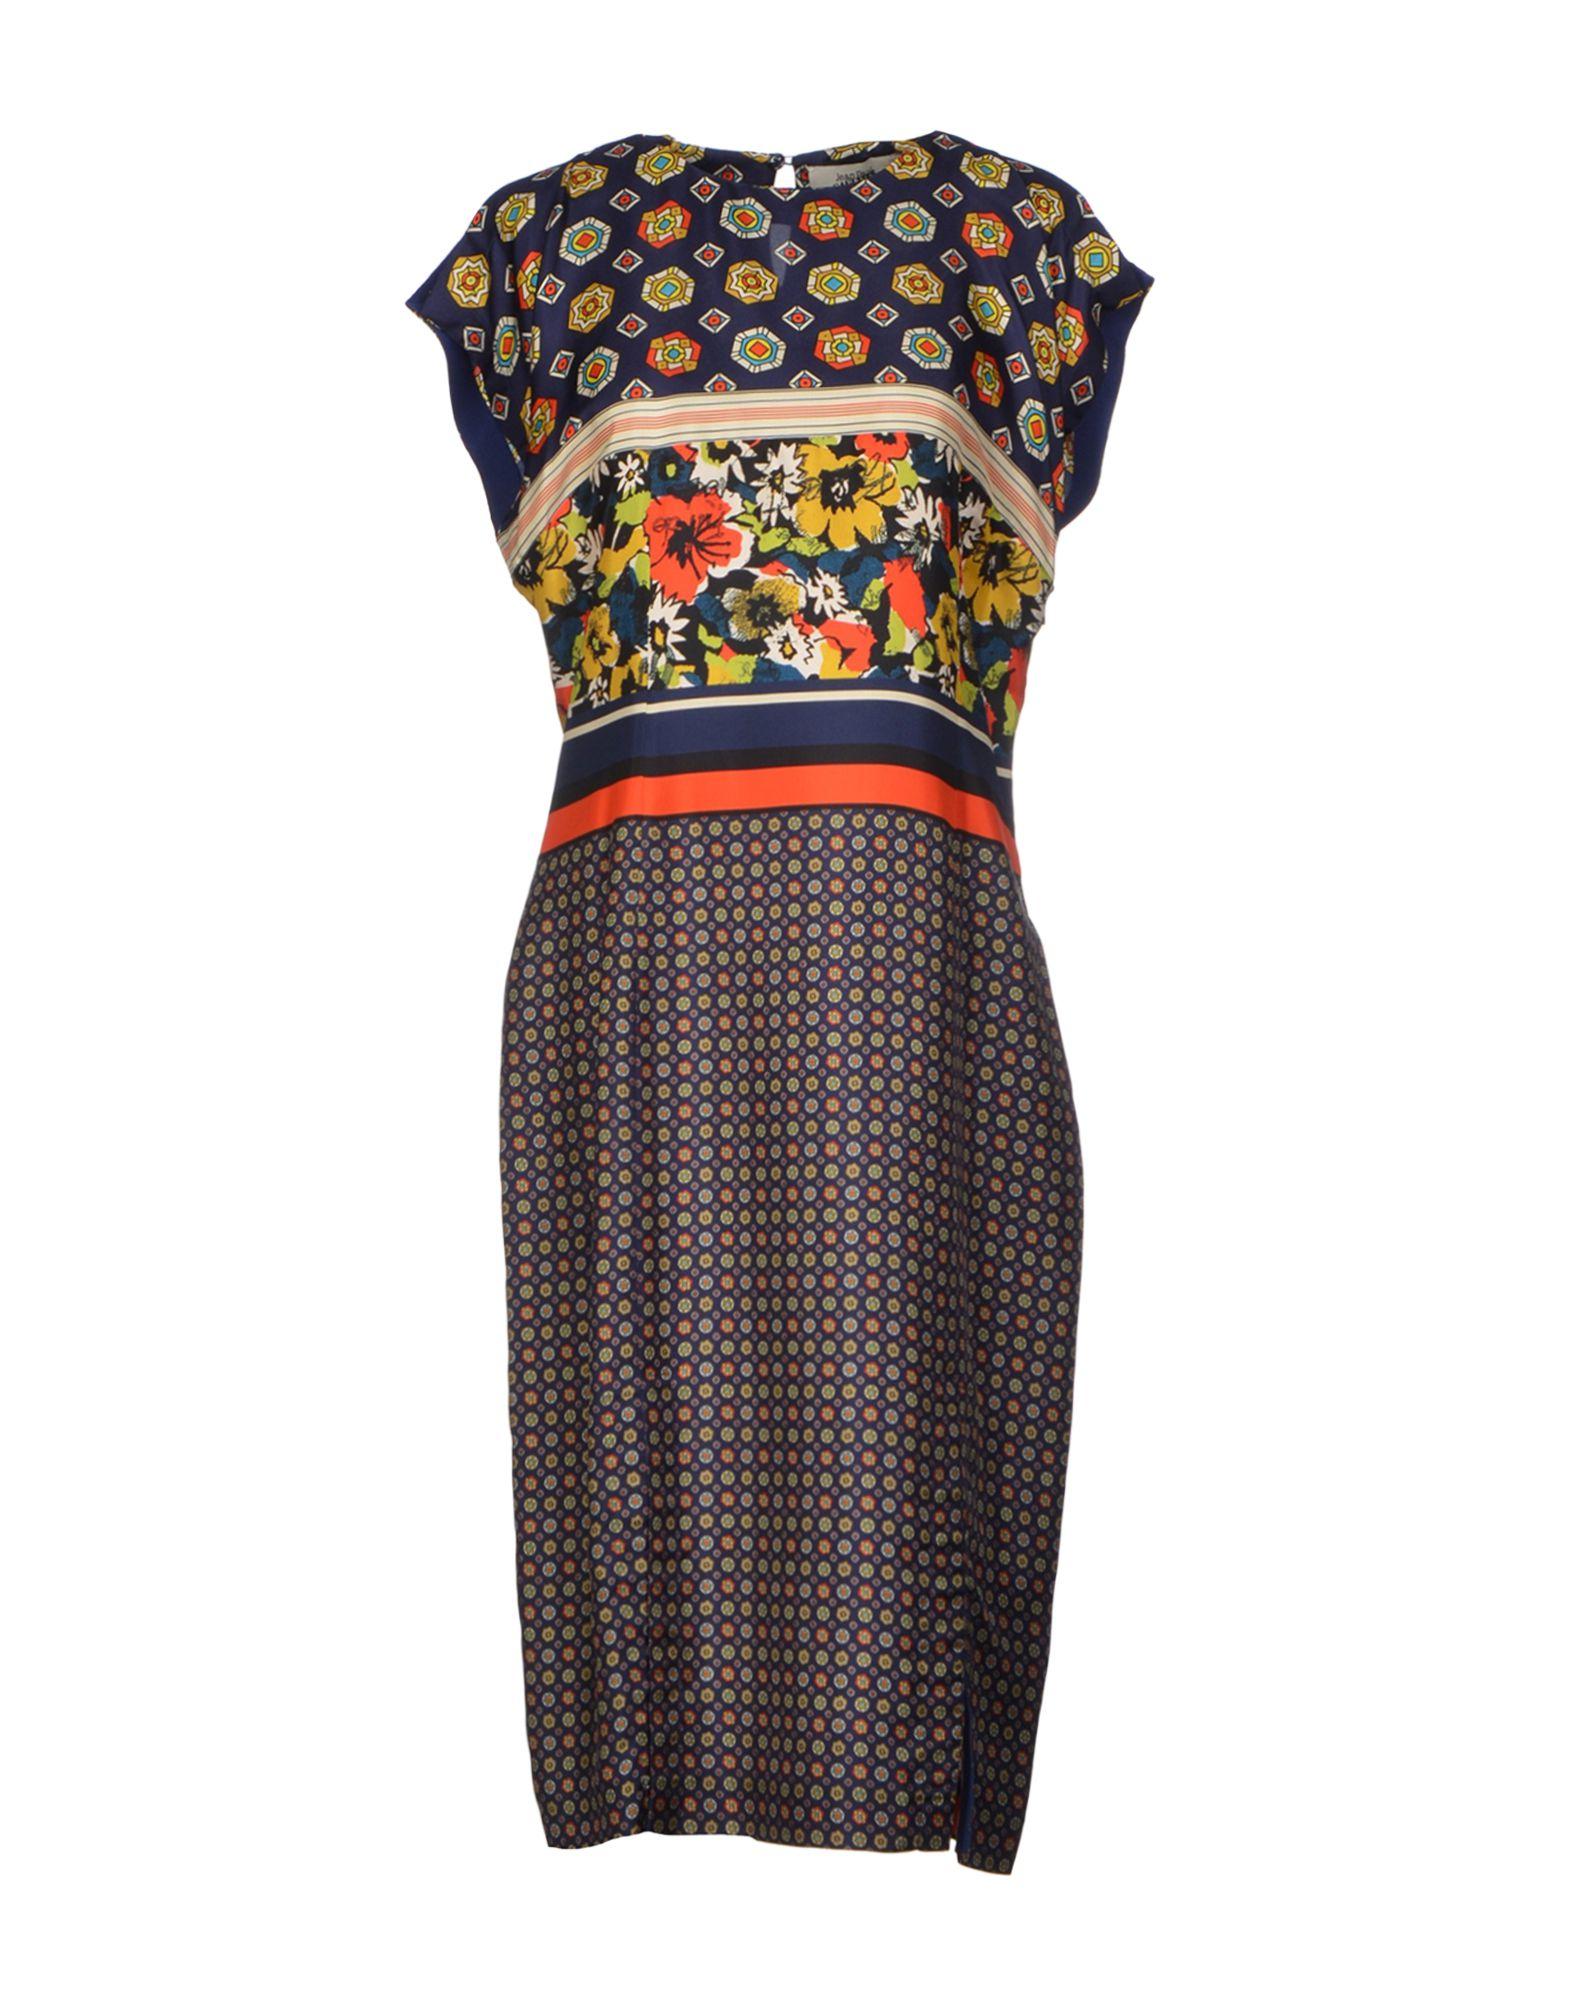 Jean Paul Gaultier Clothing Online Shop